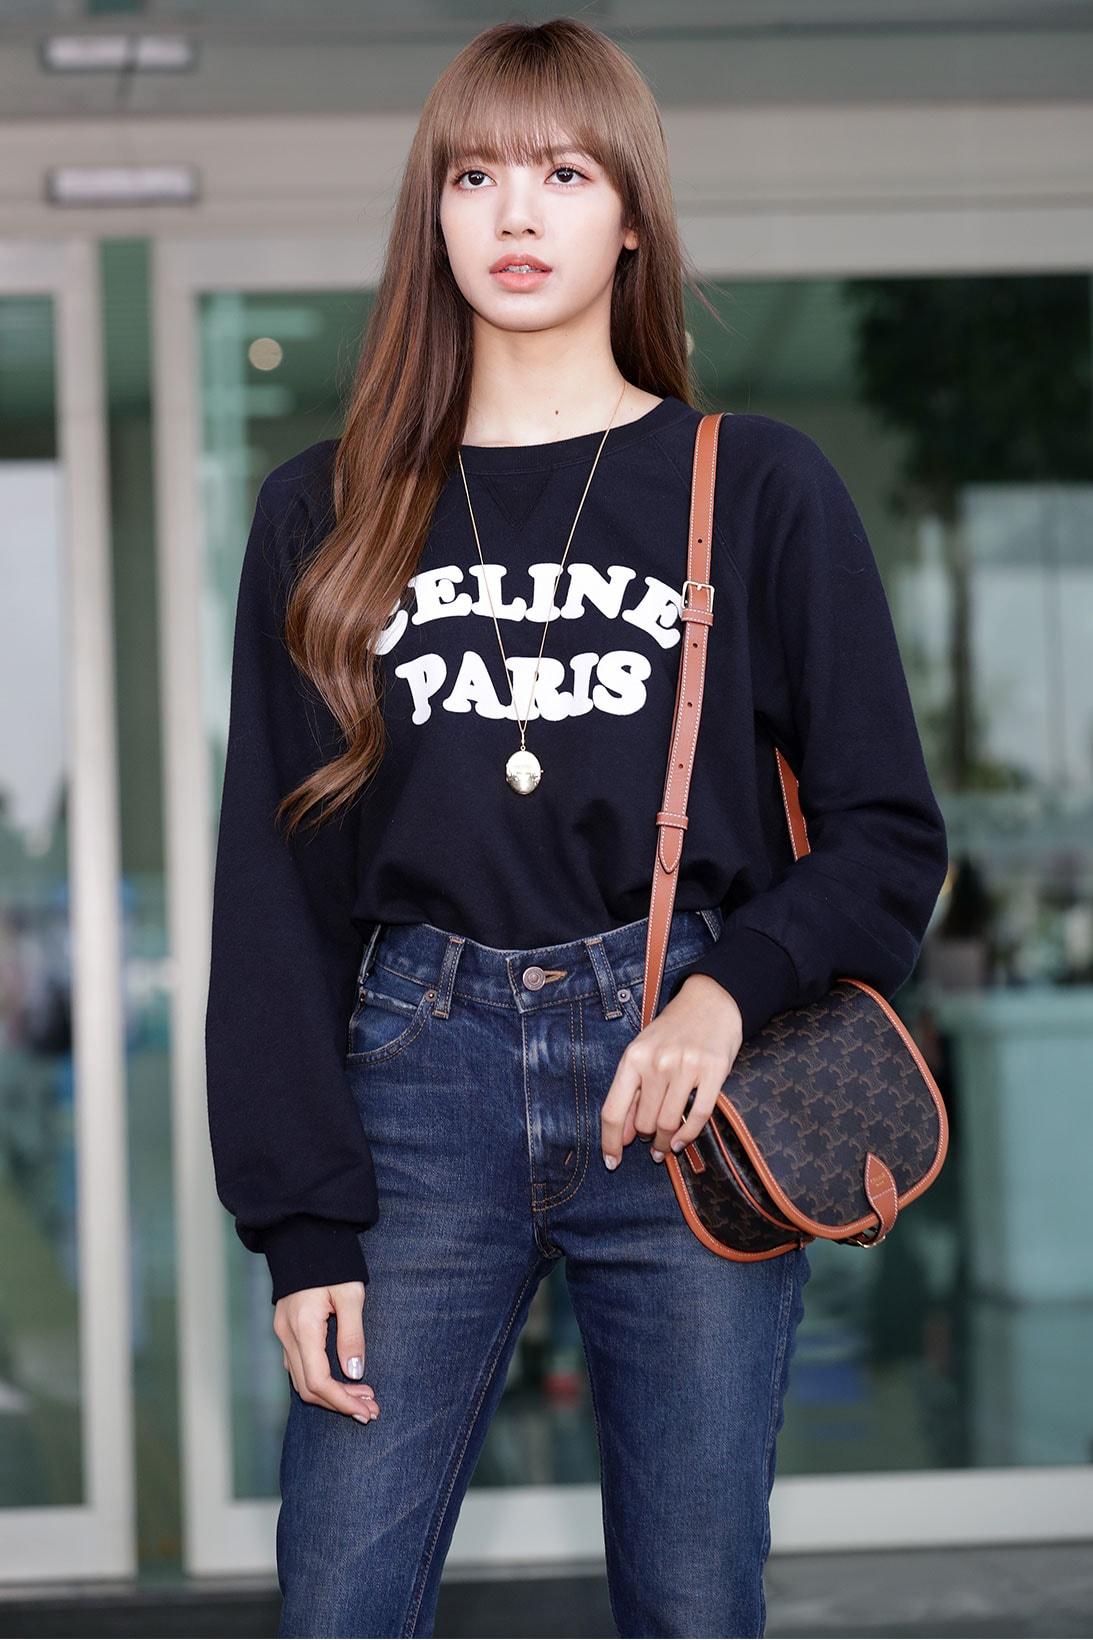 blackpink lisa style outfit wardrobe essentials how to dress like k-pop celebrity singer